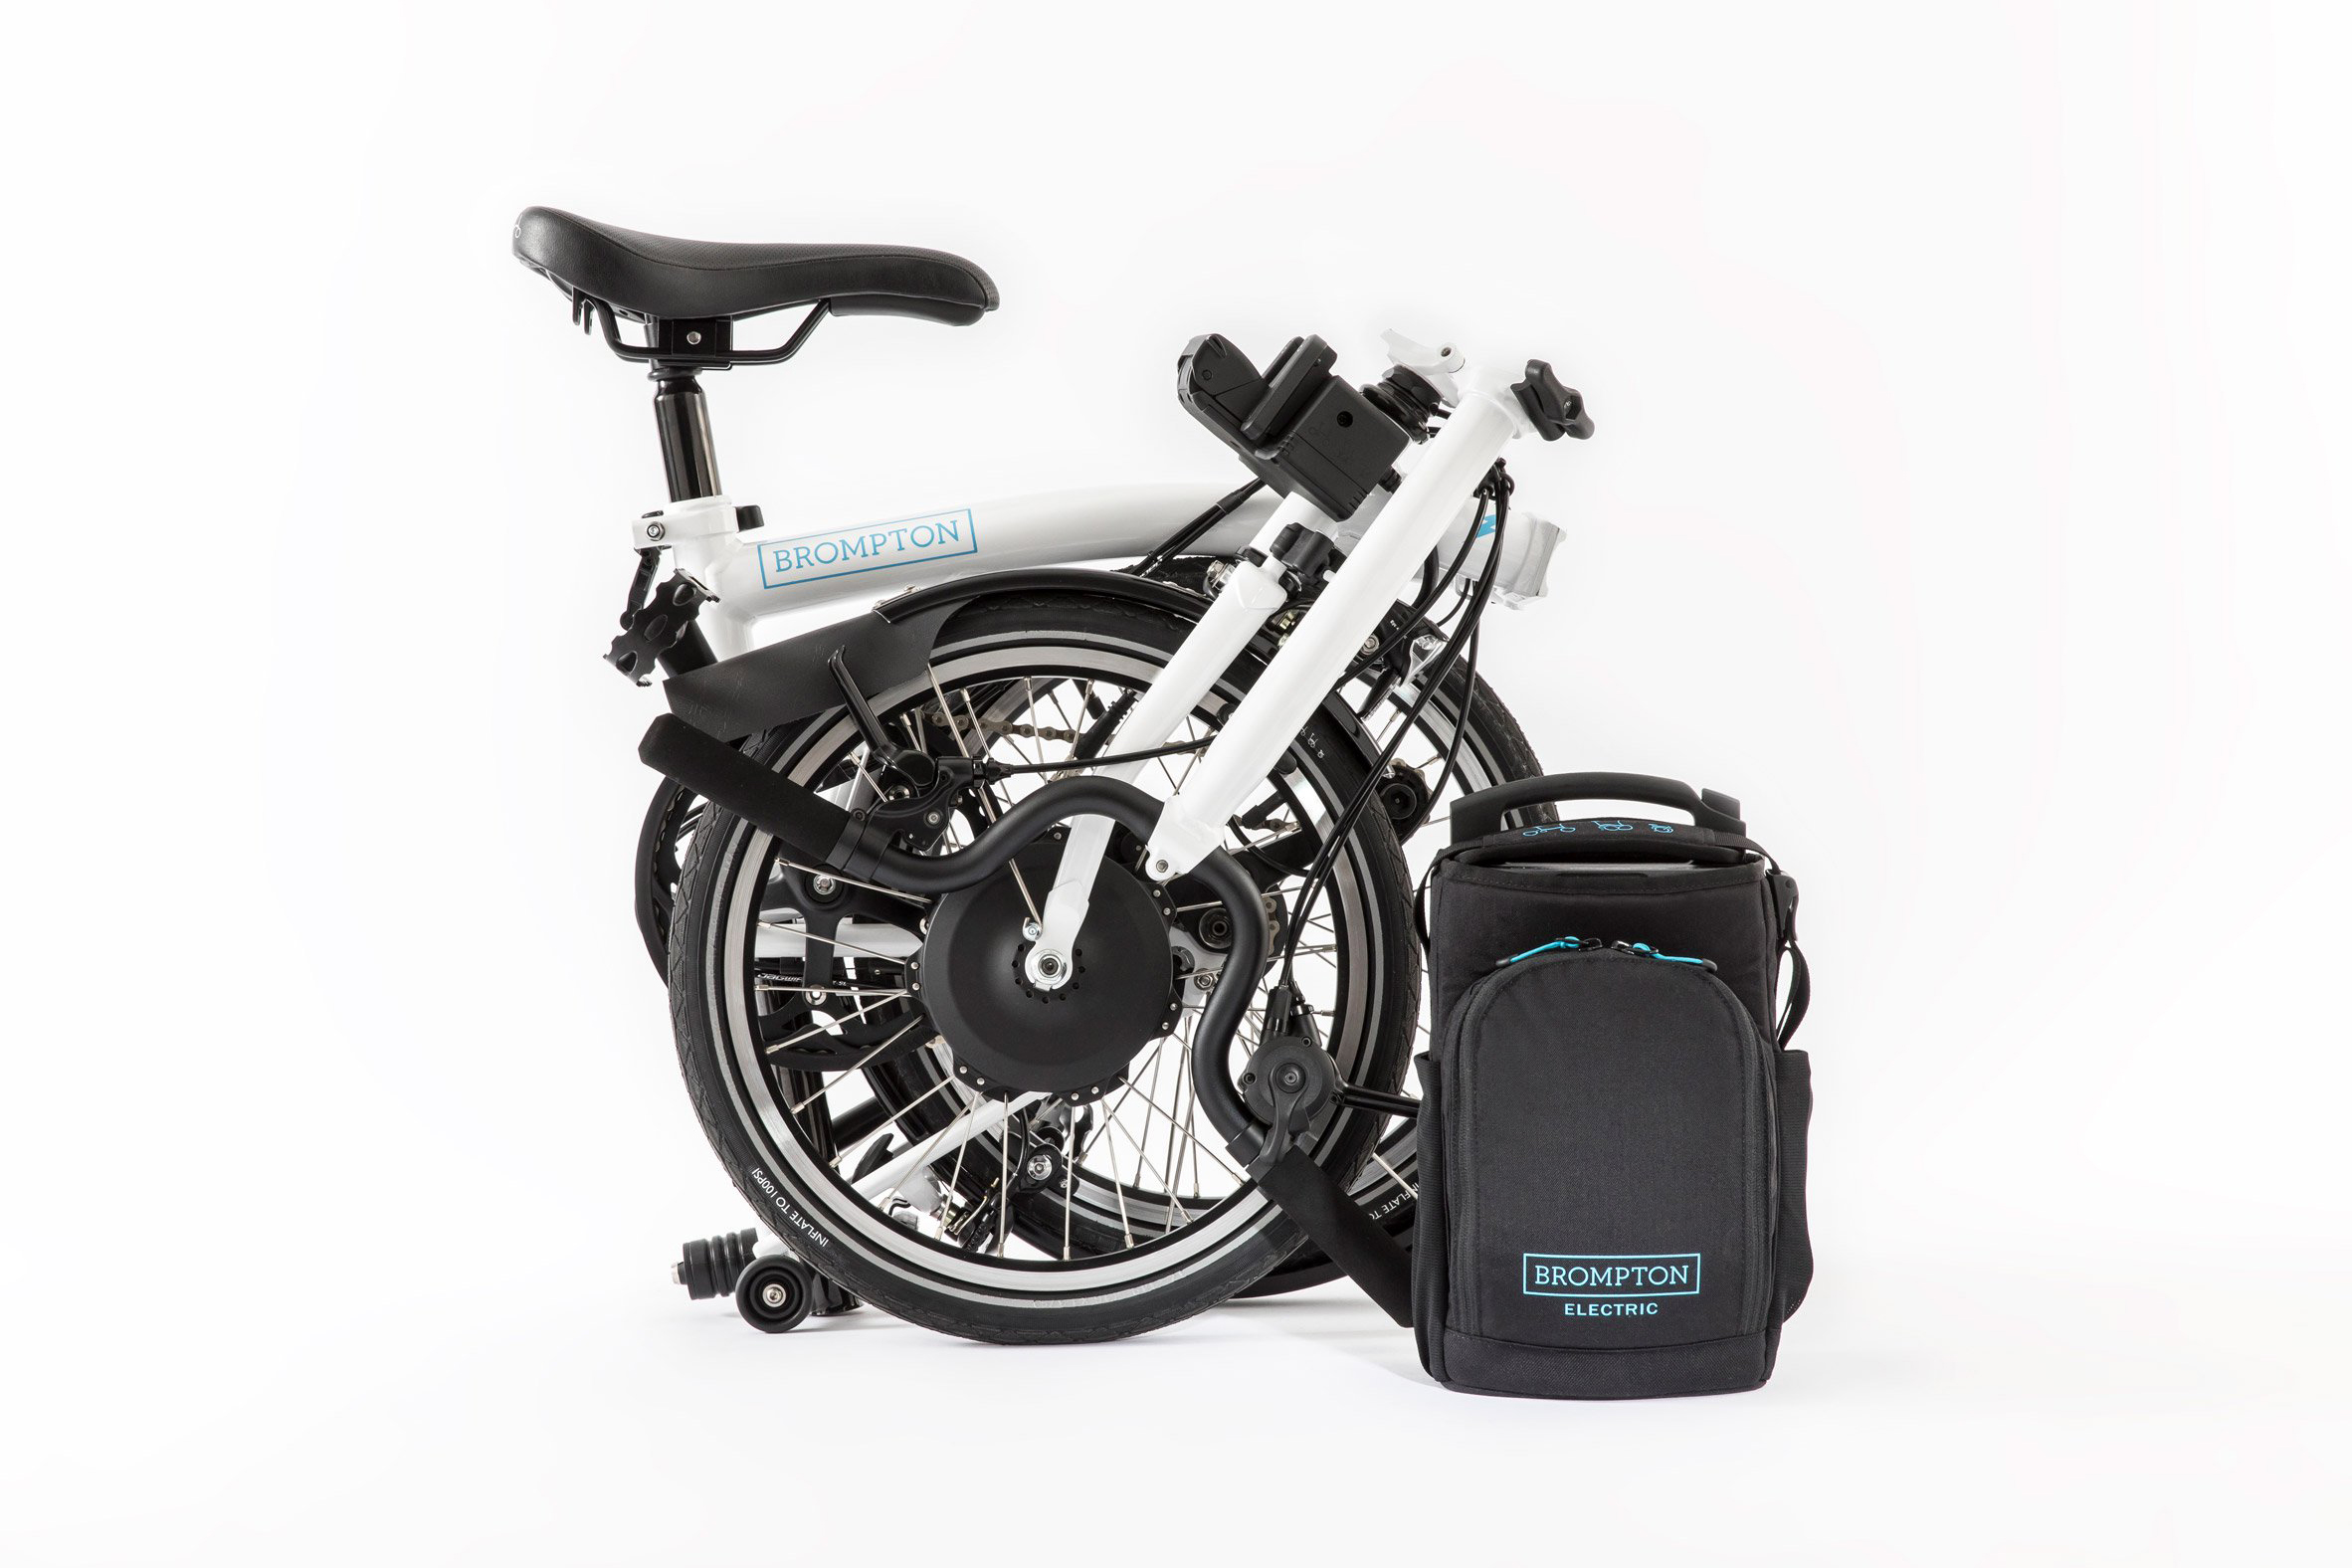 brompton-electric-bike-design-transport-_dezeen_2364_col_21.jpg